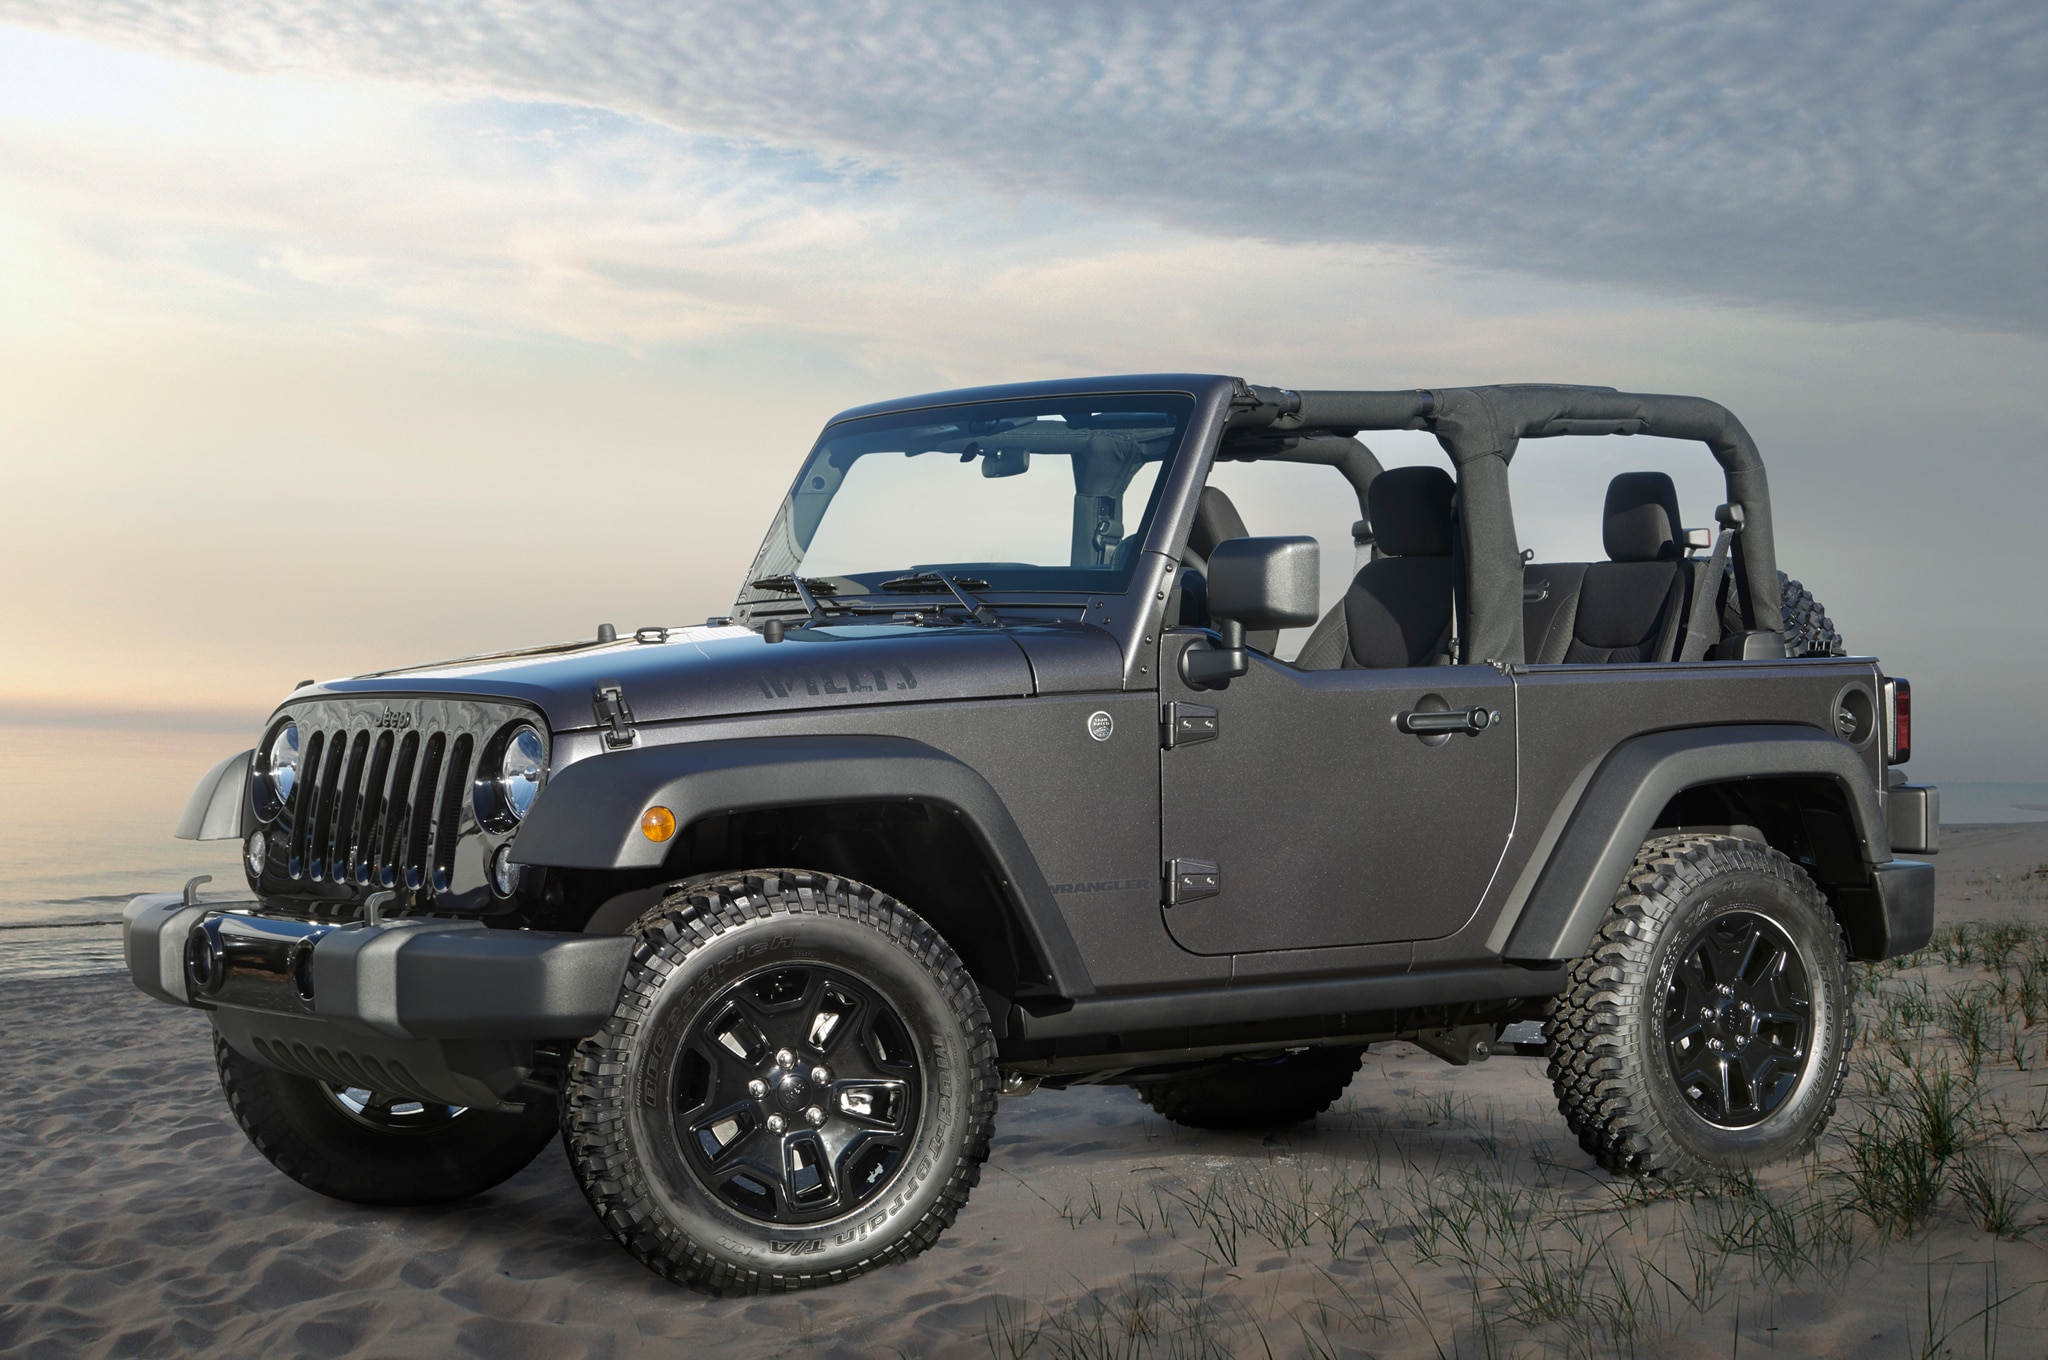 2014 jeep wrangler willys wheeler edition revealed. Black Bedroom Furniture Sets. Home Design Ideas